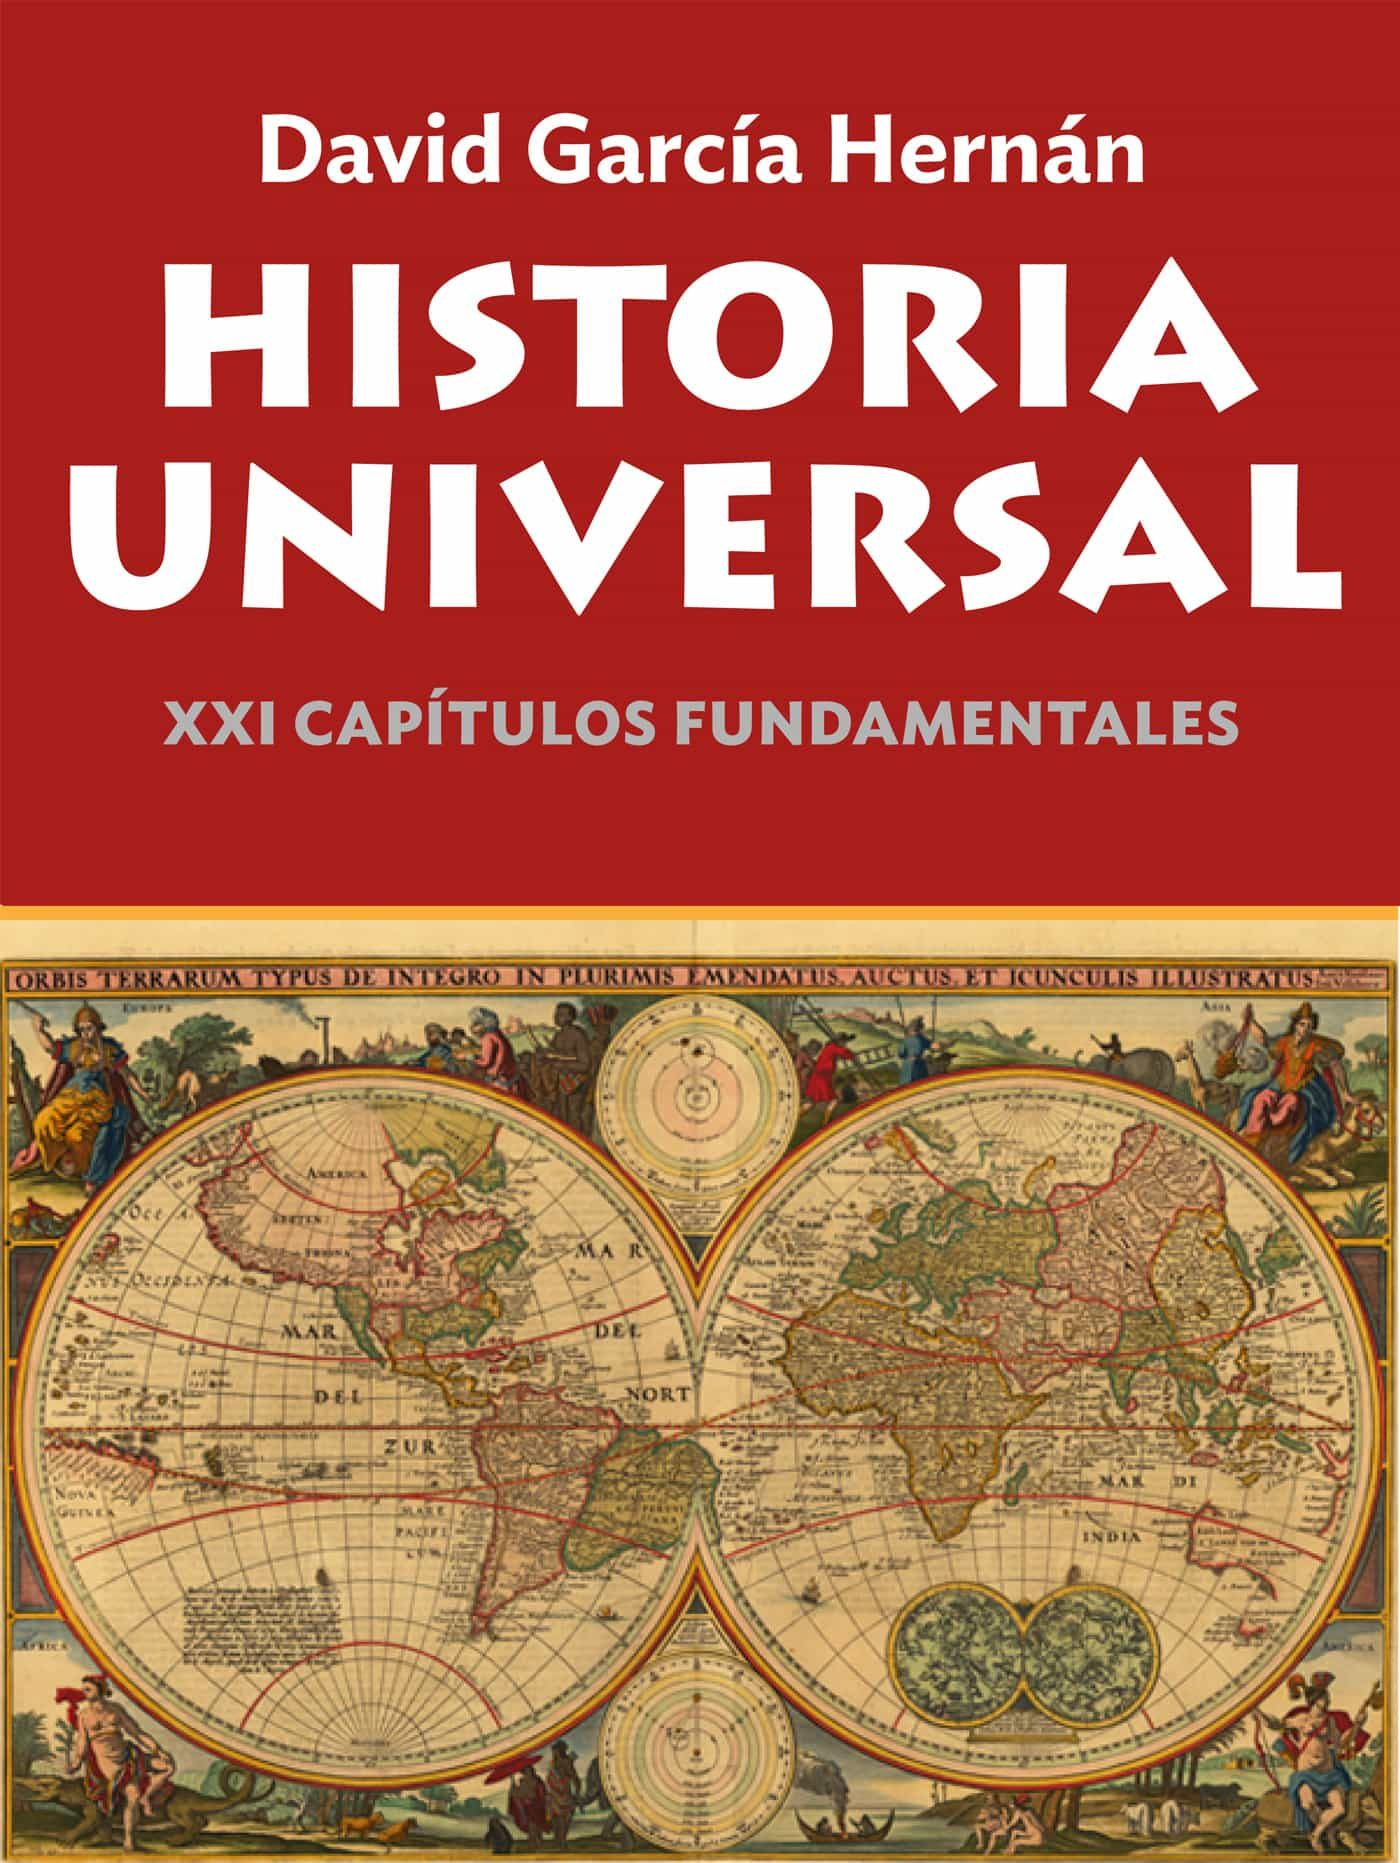 HISTORIA UNIVERSAL EBOOK